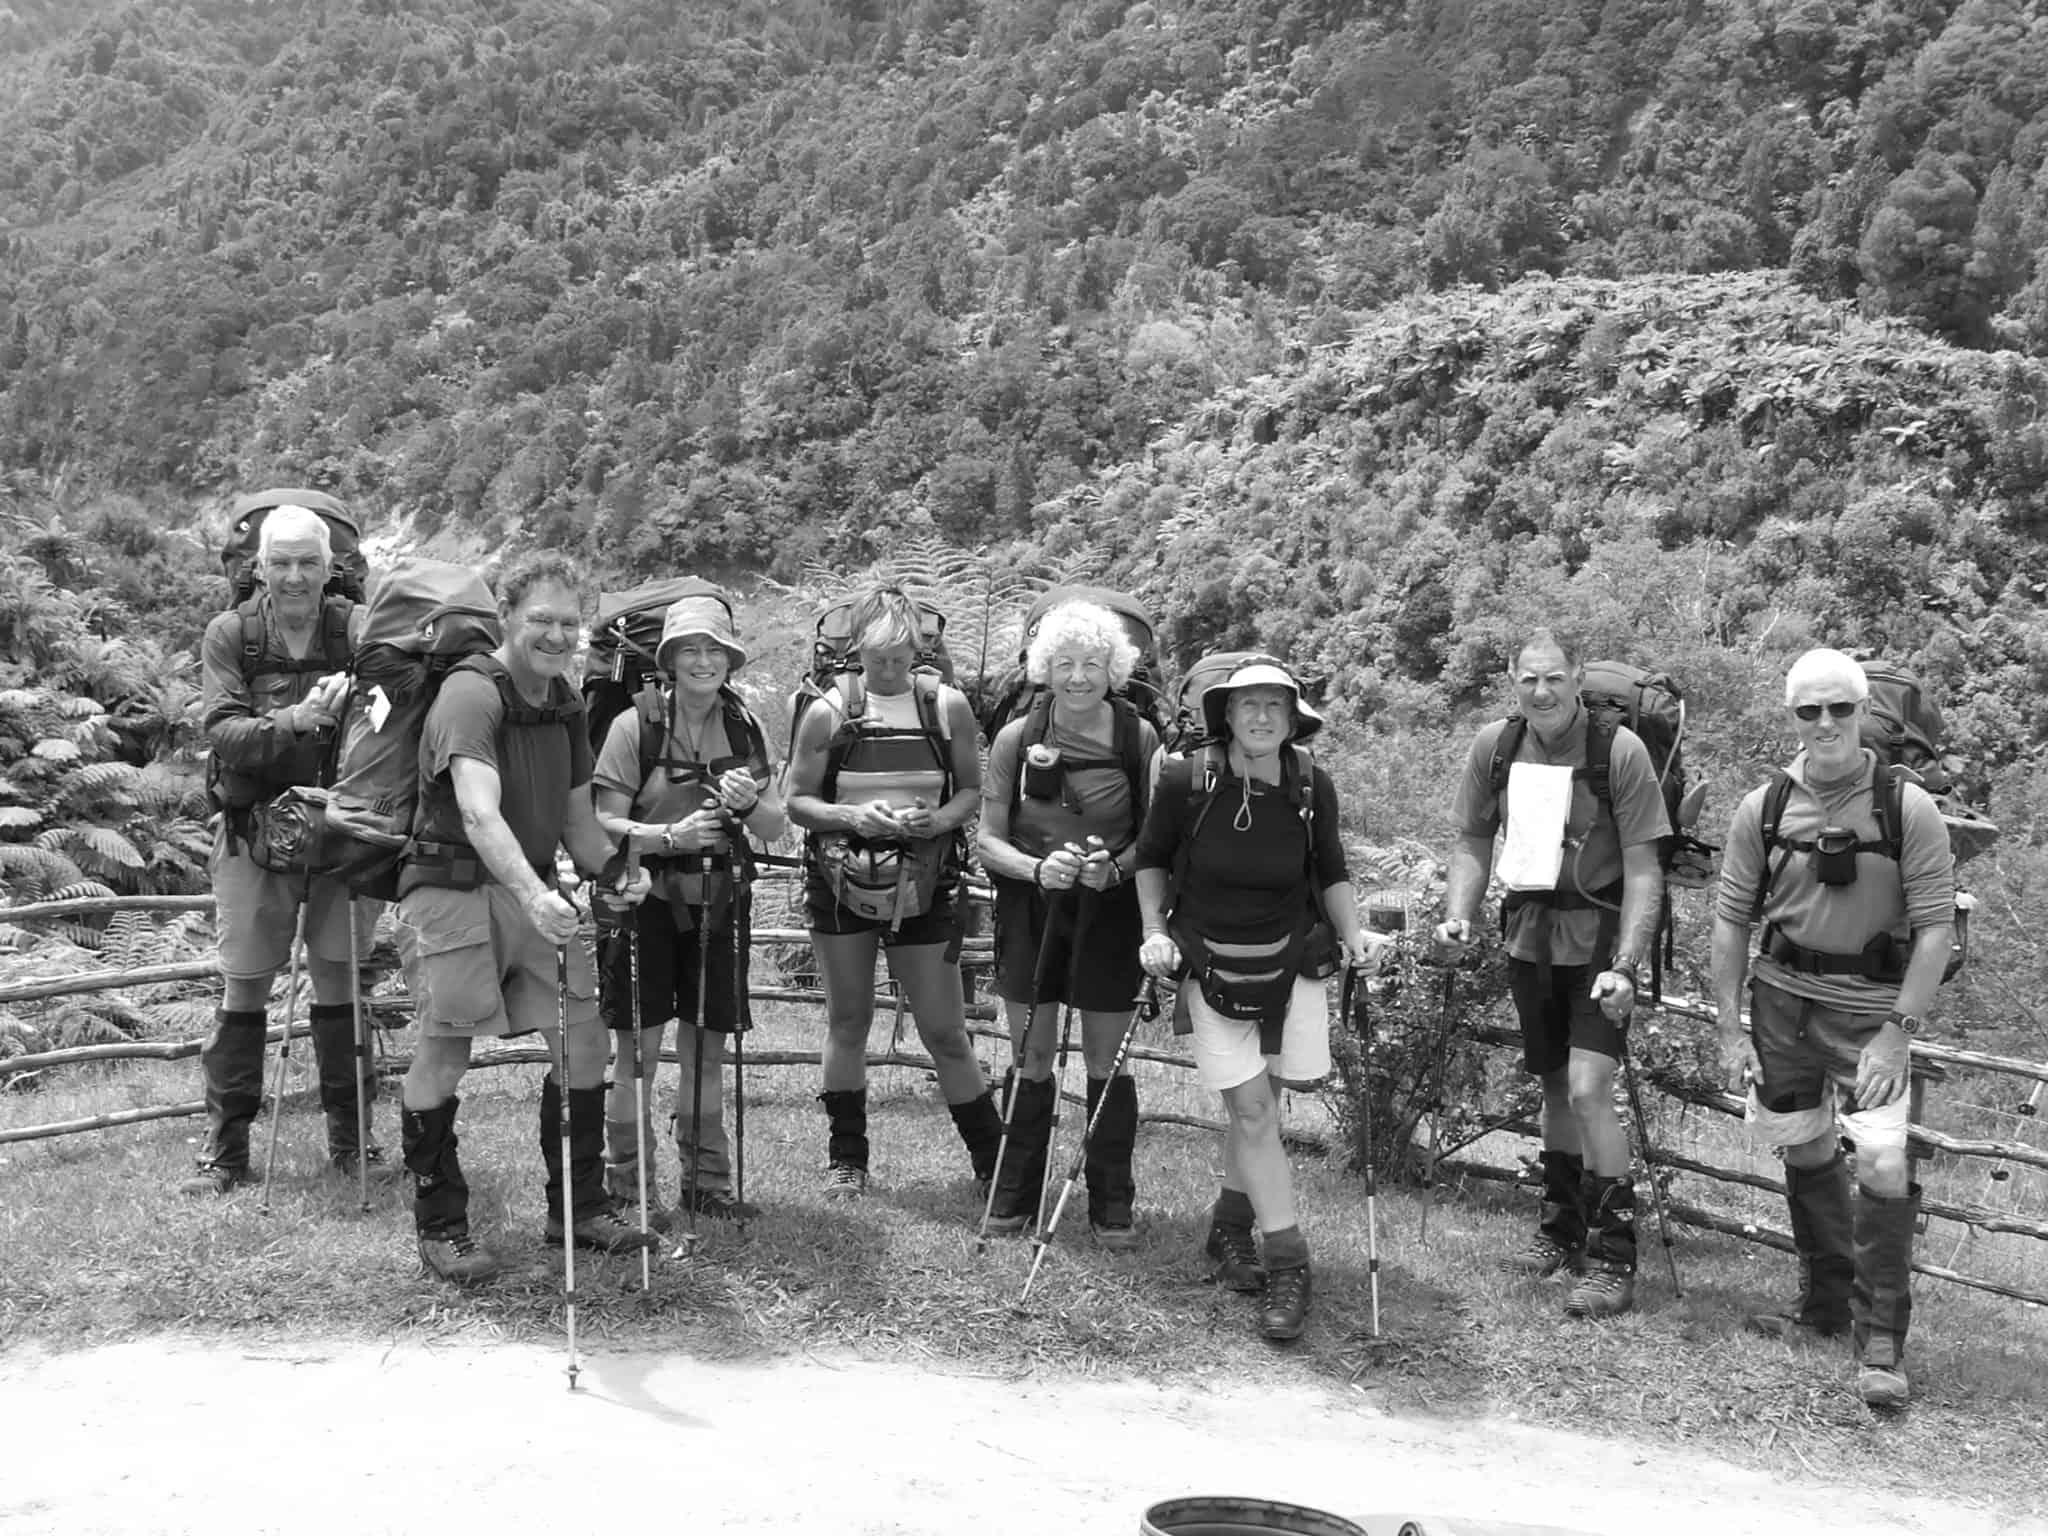 Tramping - Whanganui National Park